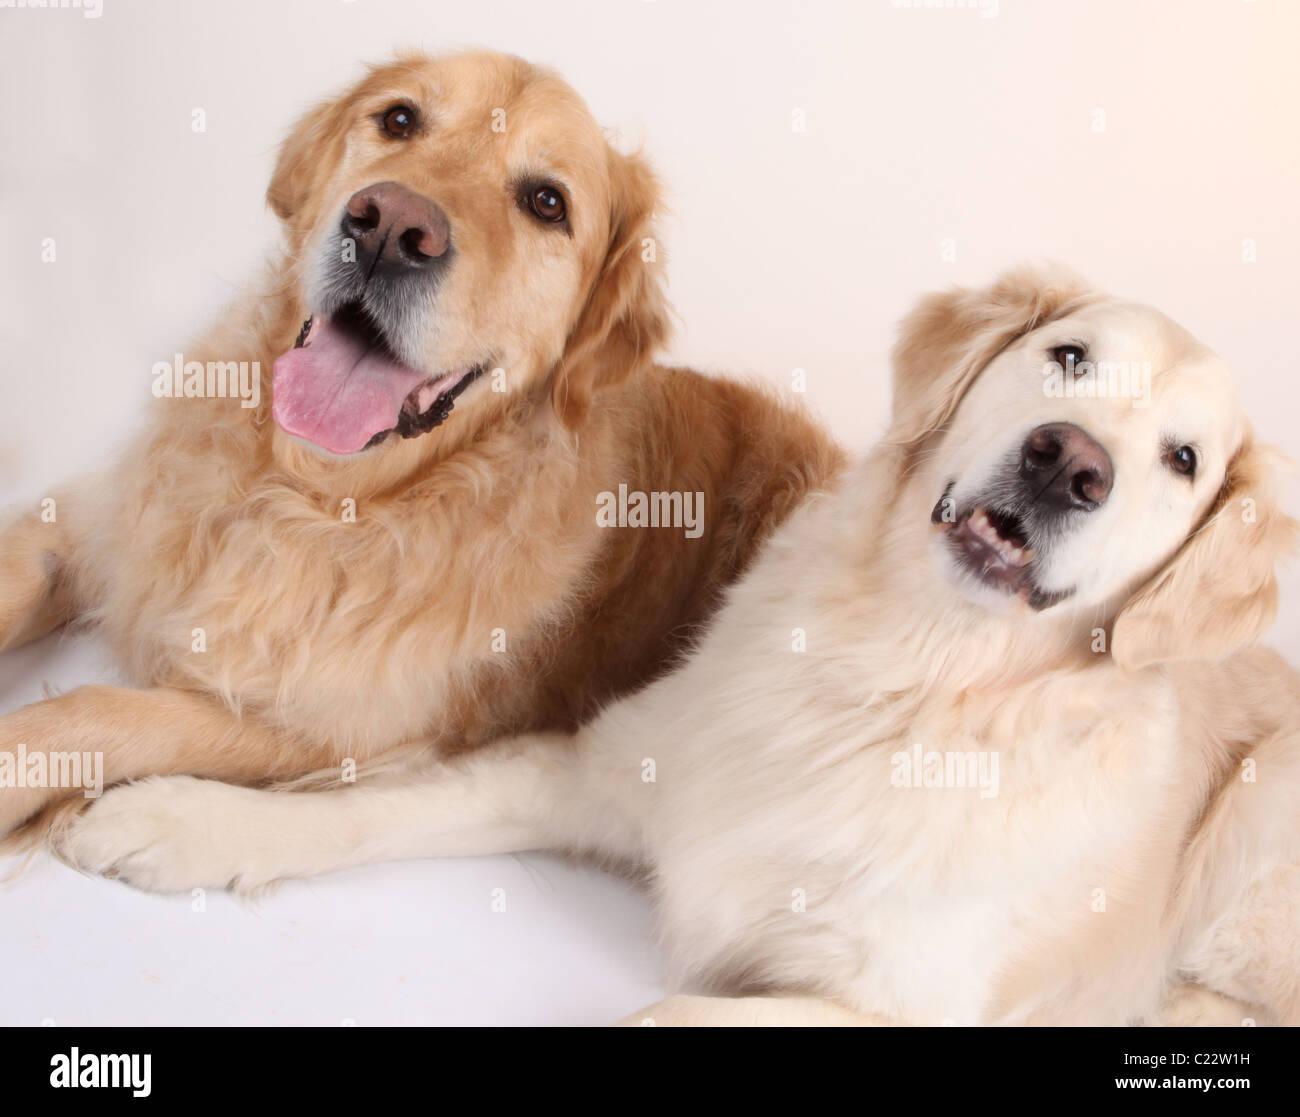 Best Friends two Golden Retrievers dogs. - Stock Image